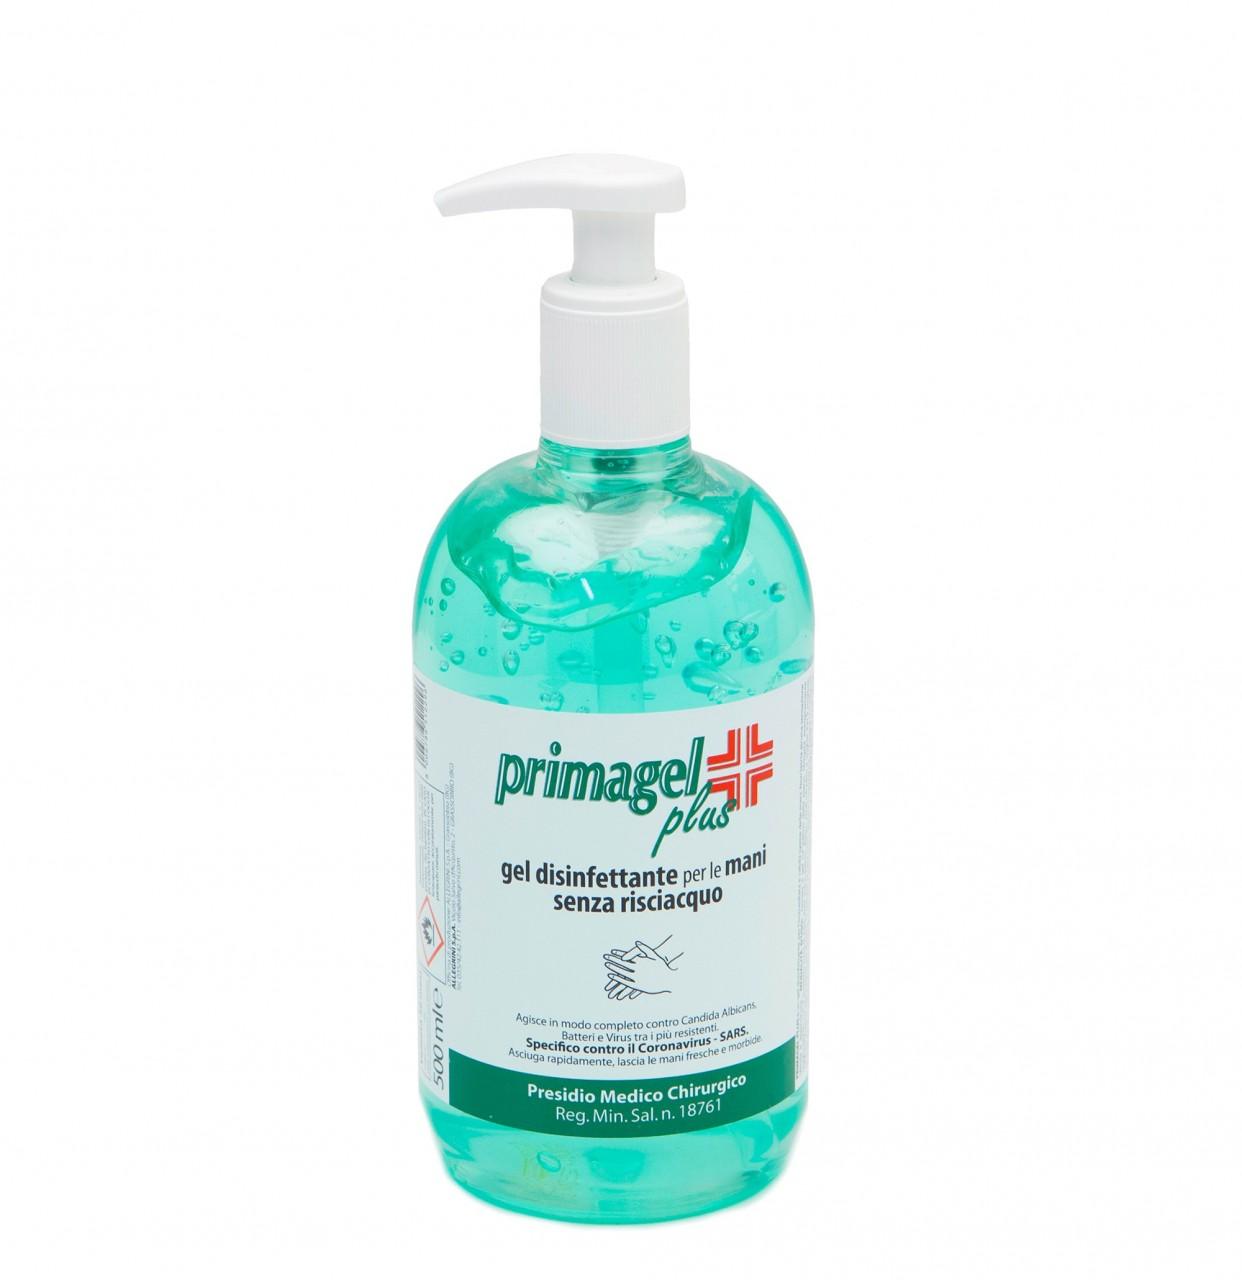 PRIMAGEL PLUS 500ml Desinfektionsgel im Pumpspender